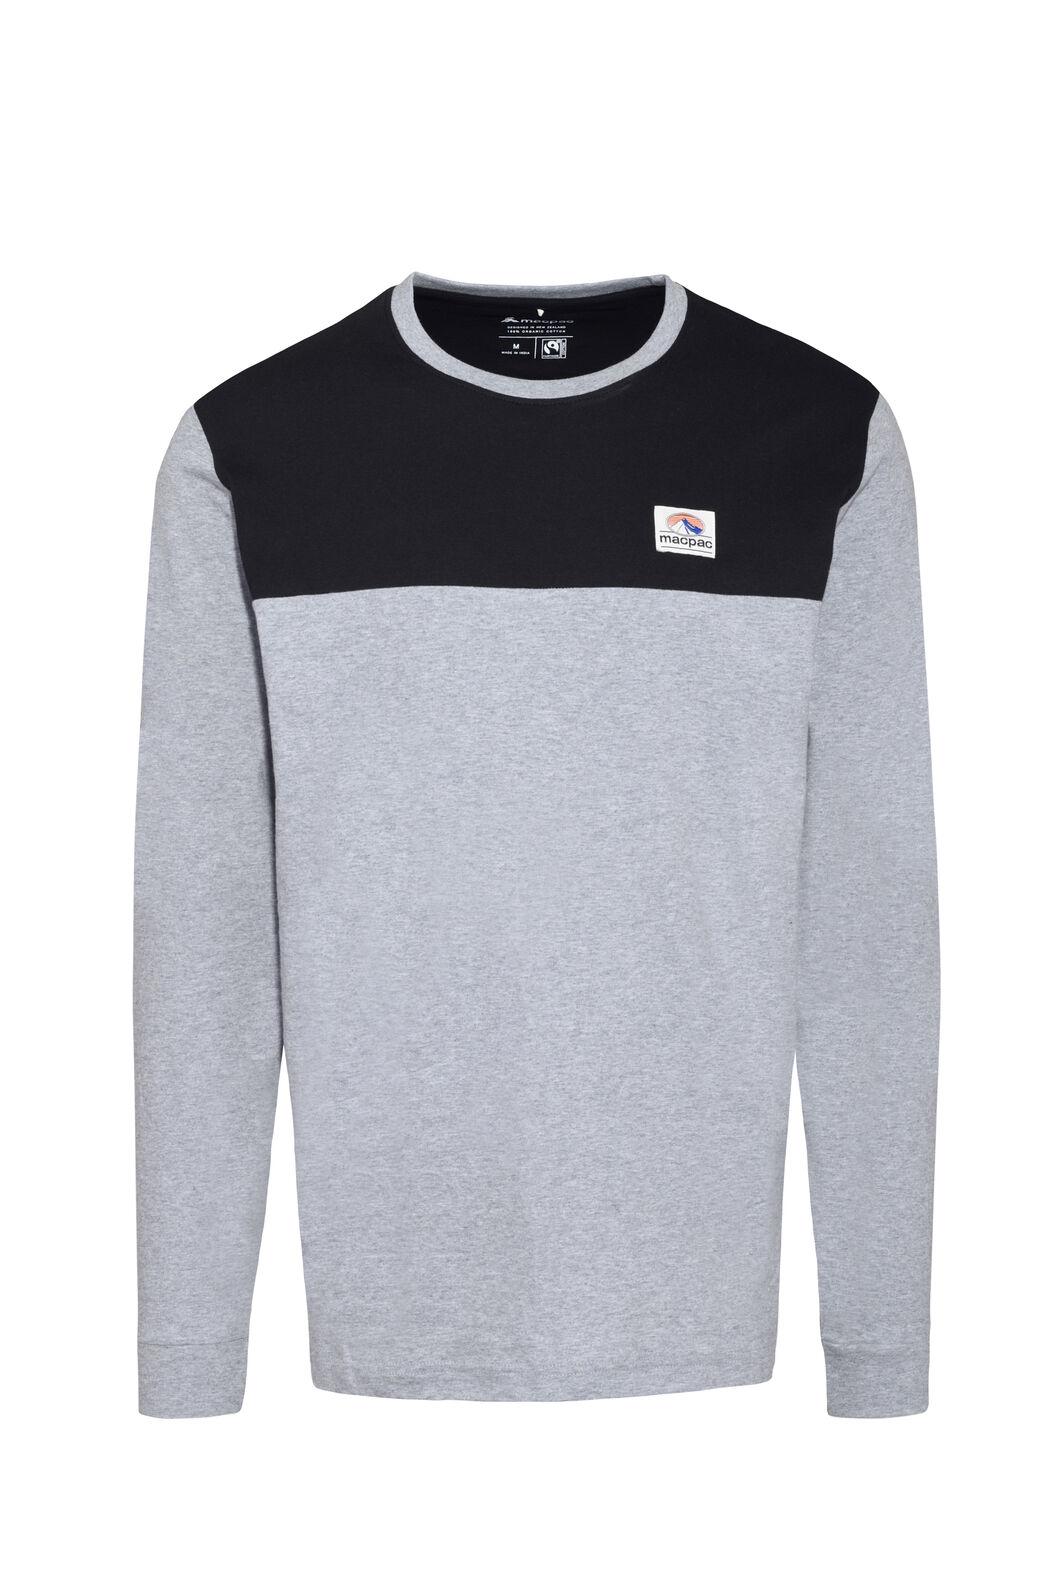 Macpac Panel Fairtrade Organic Cotton Long Sleeve Tee — Men's, Grey Marle, hi-res